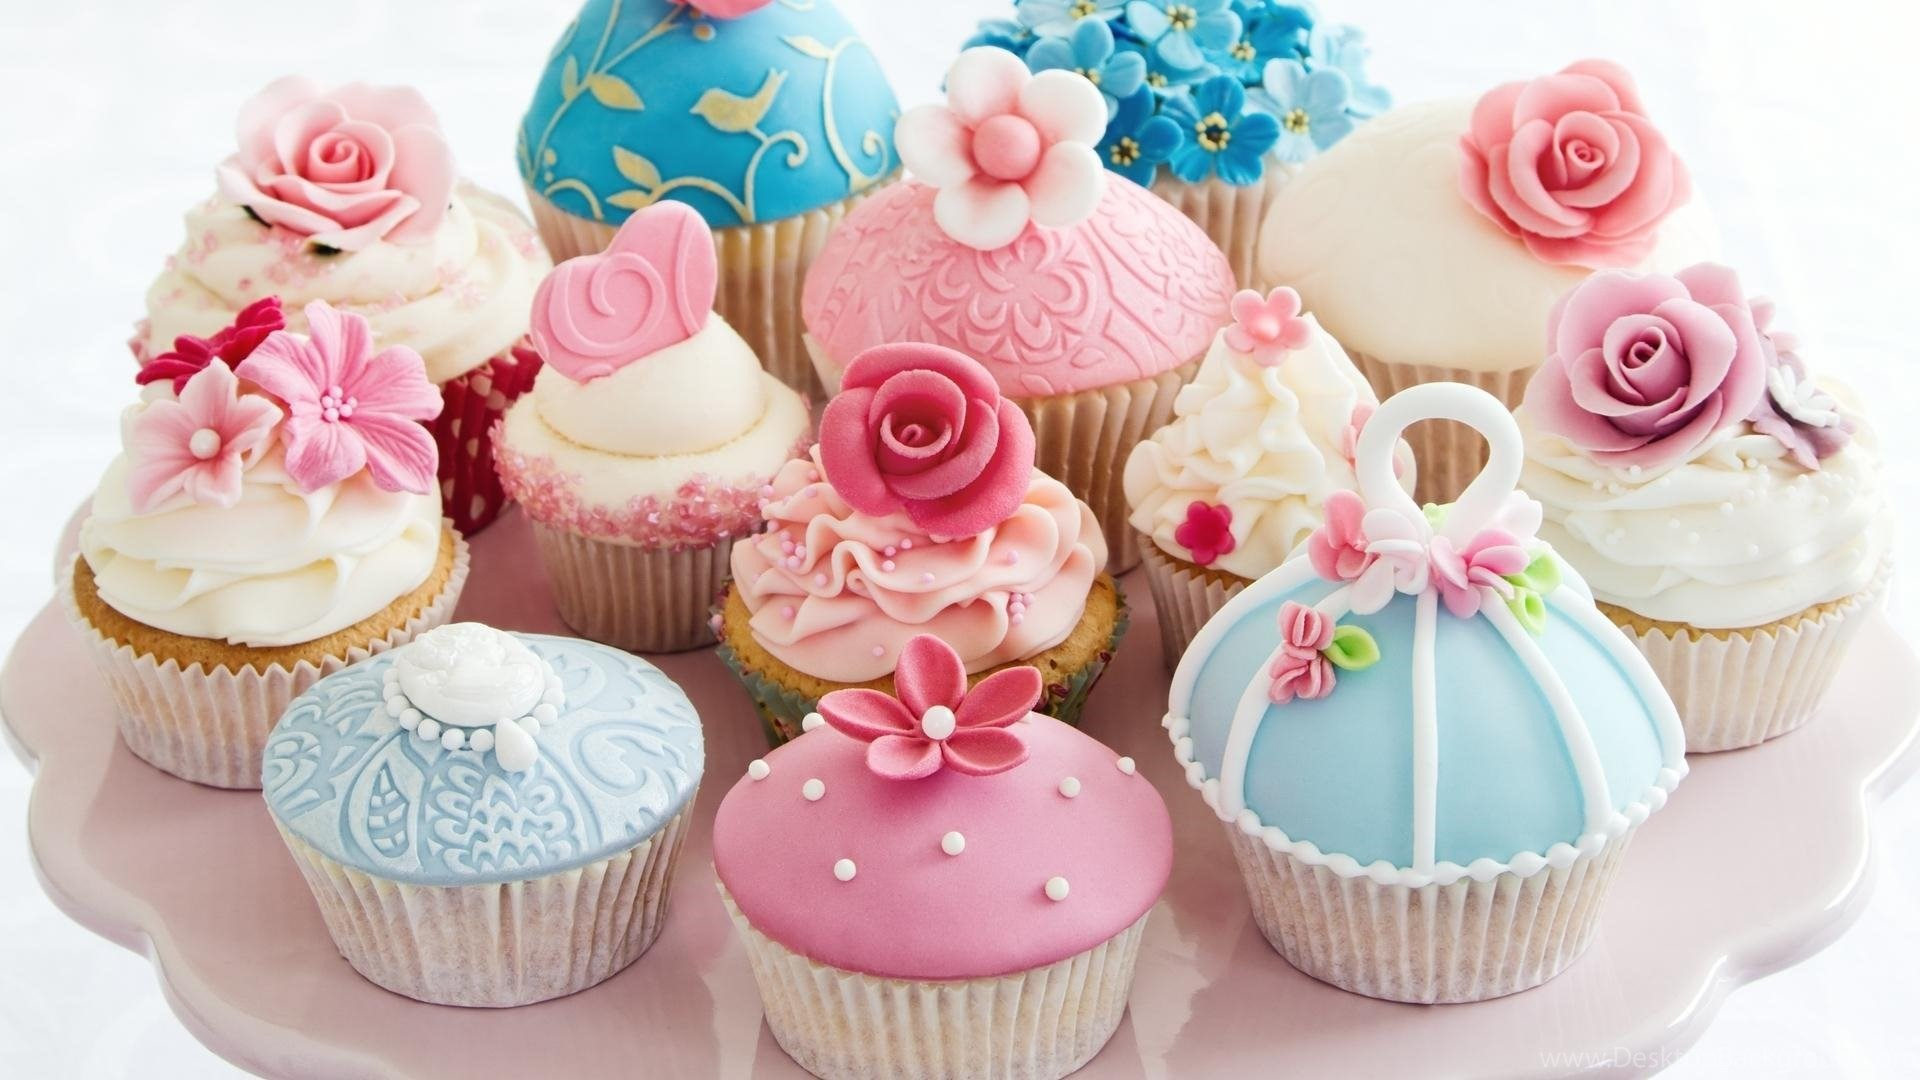 Cute Pics Of Cupcakes